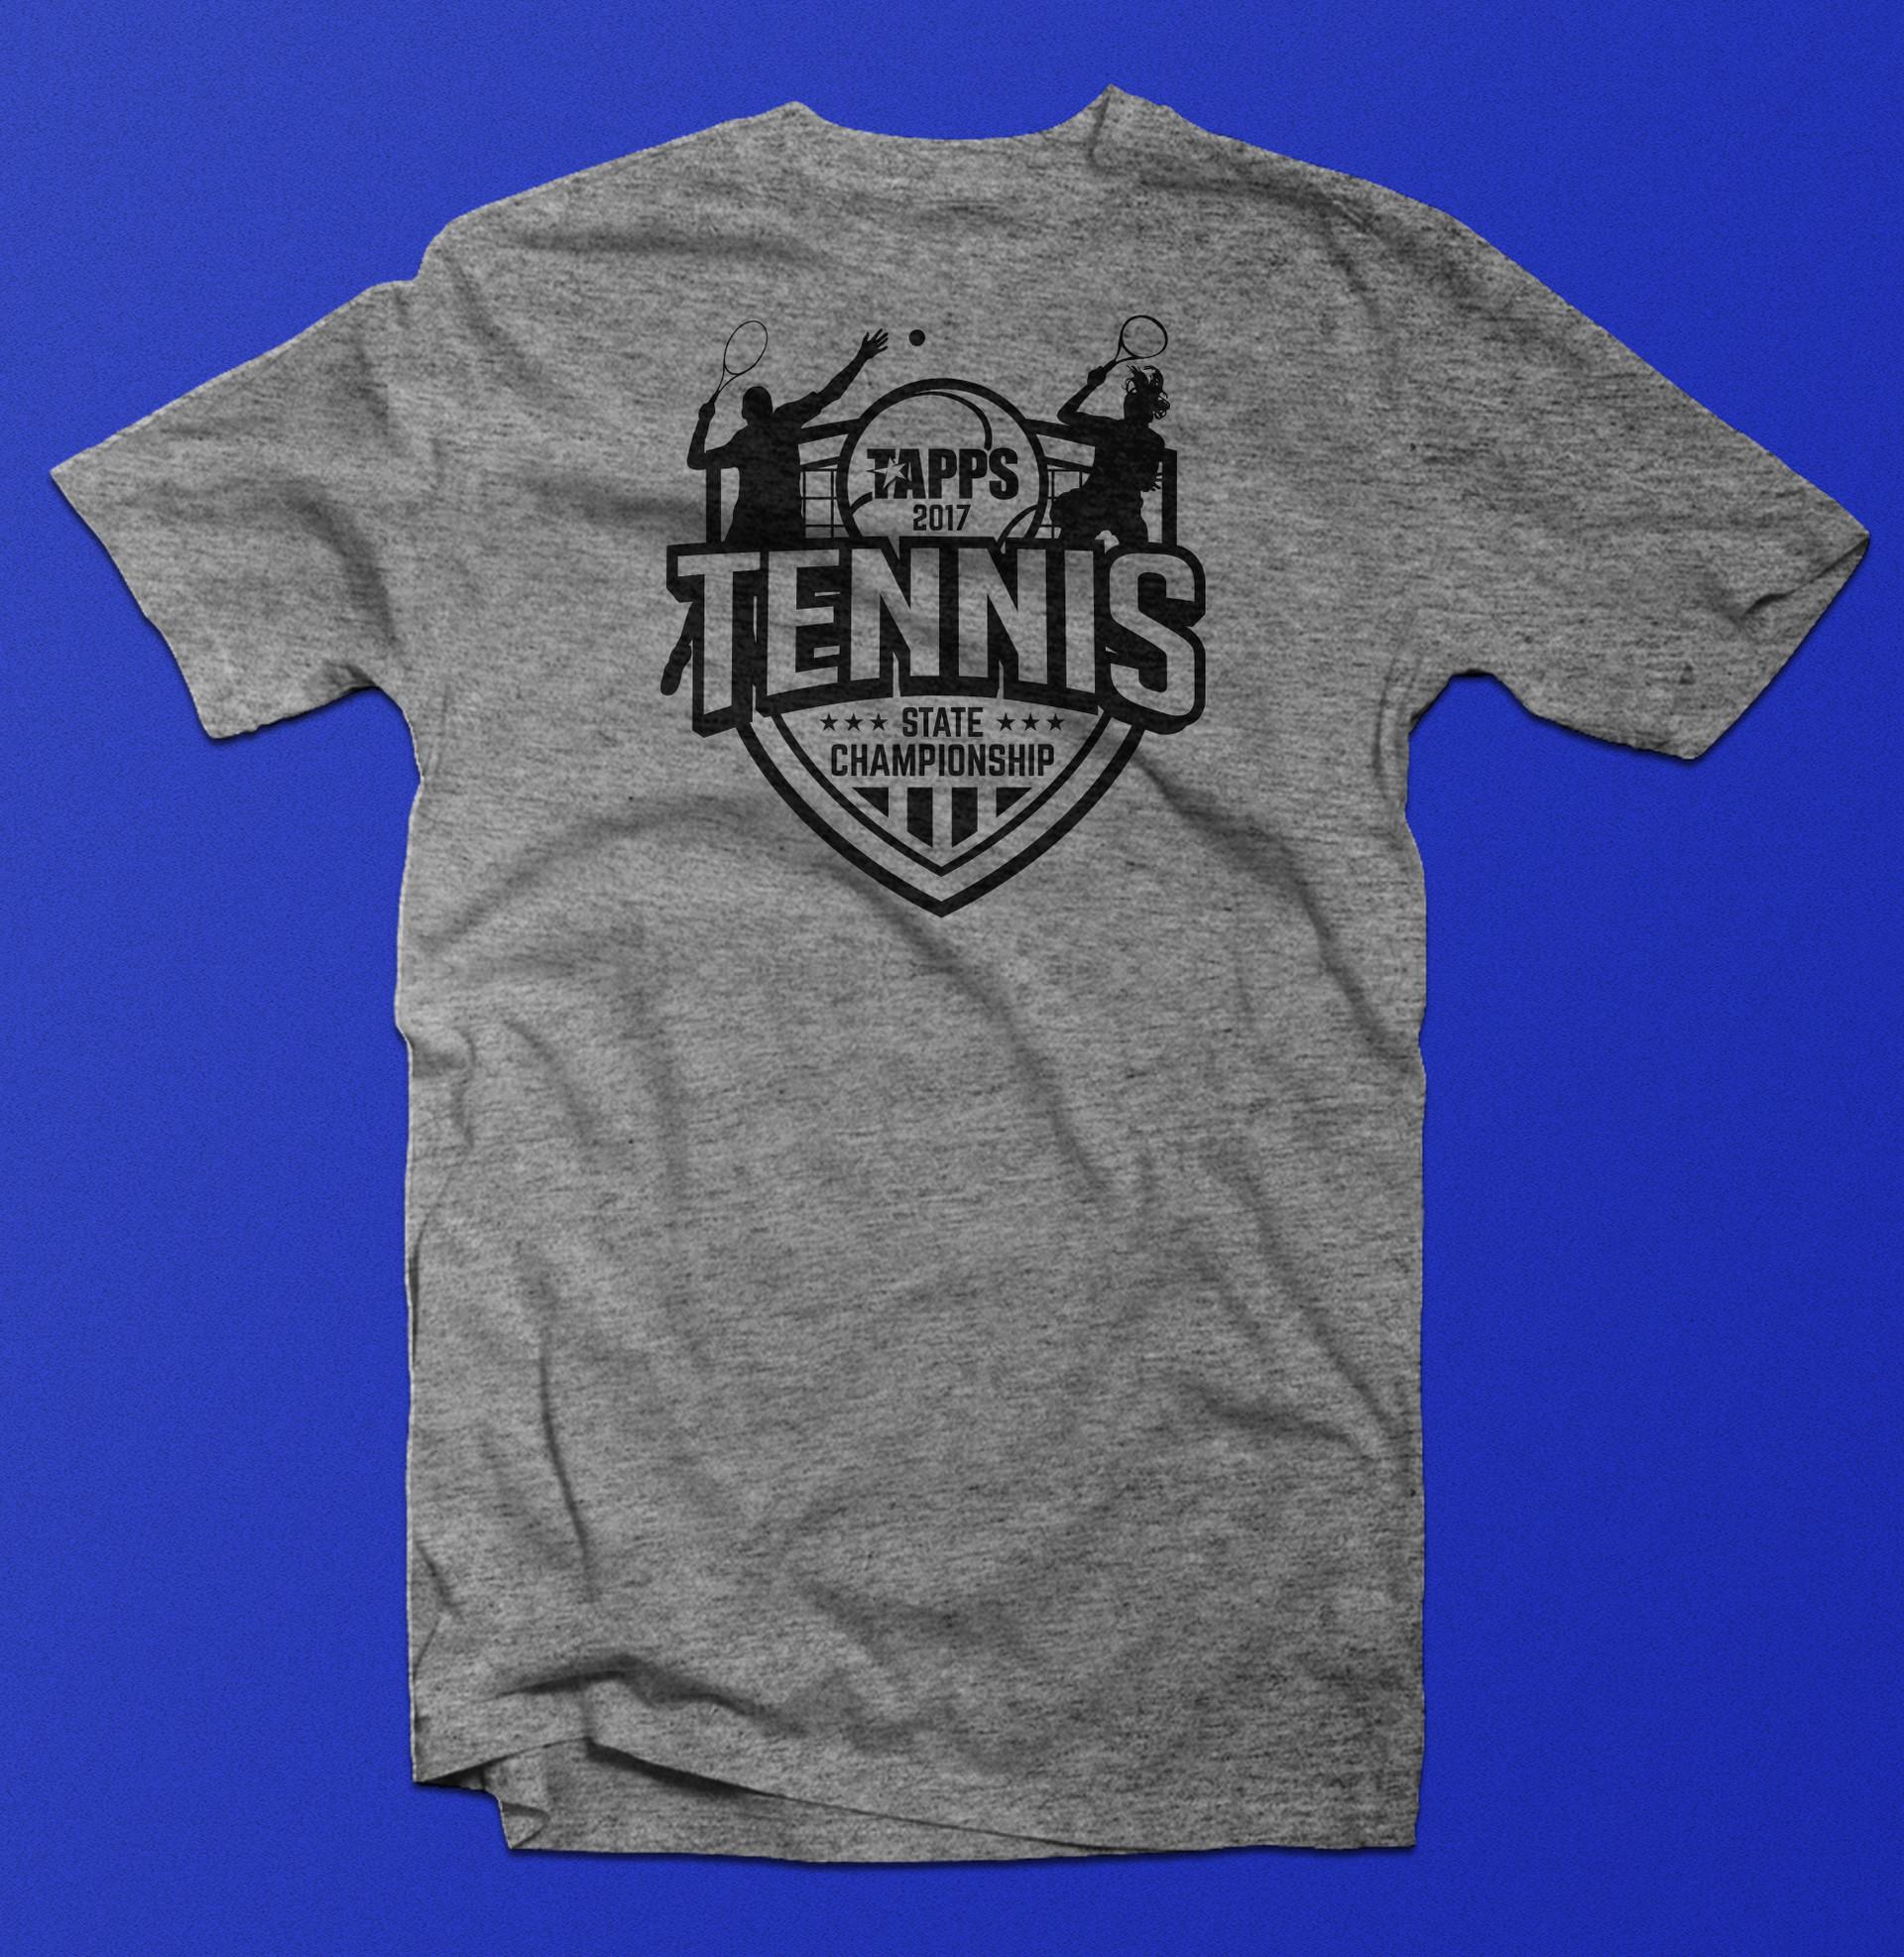 James Pitkin Shirt Artwork Tennis,Short Diamond Mangalsutra Designs Latest